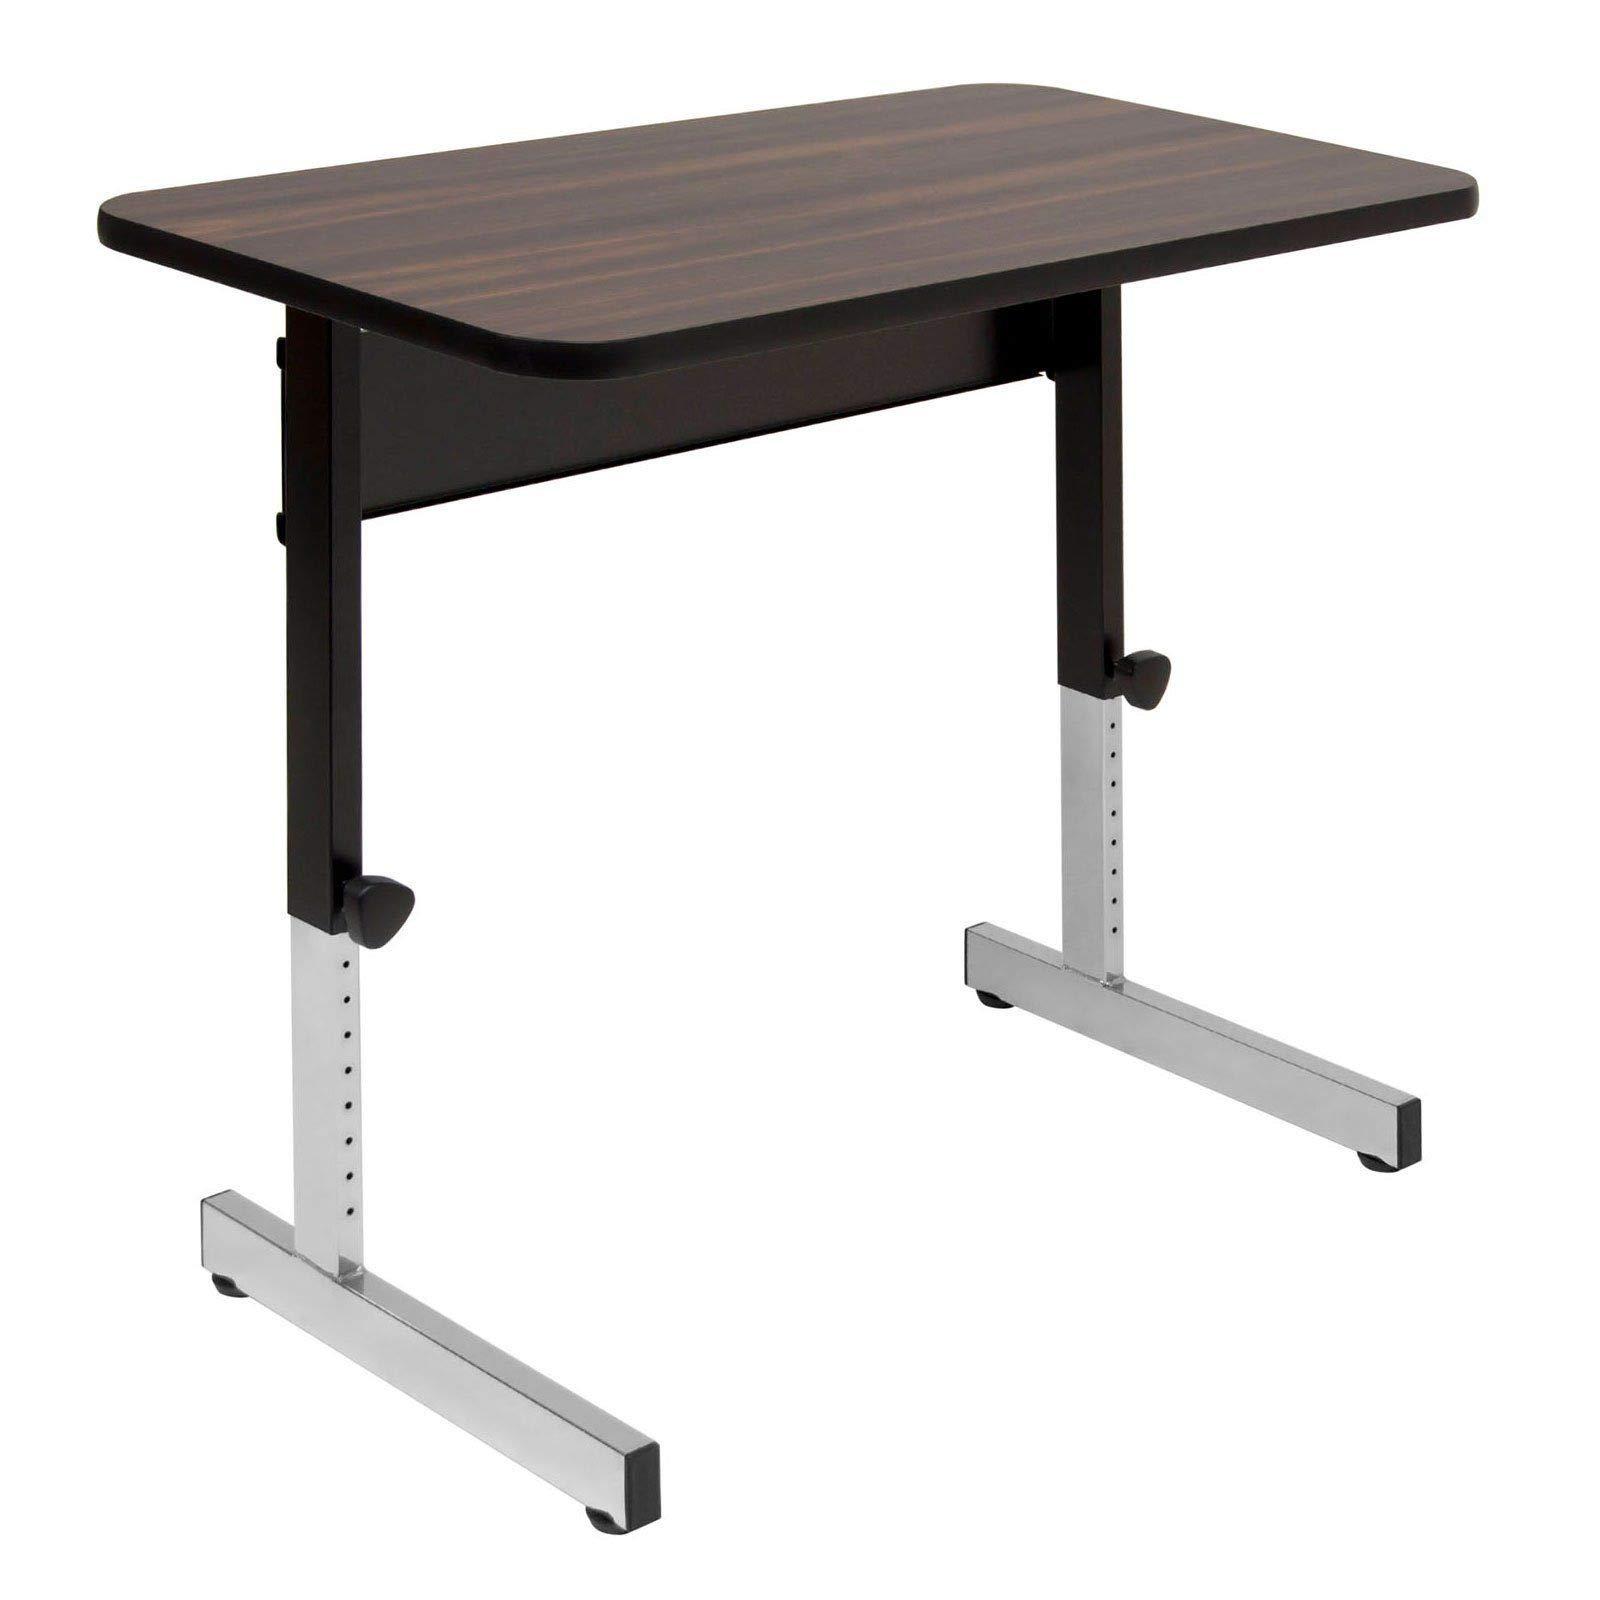 MRT SUPPLY Adapta Table 36'' x 20'' Top Manual Height Adjustable Desk, Walnut with Ebook